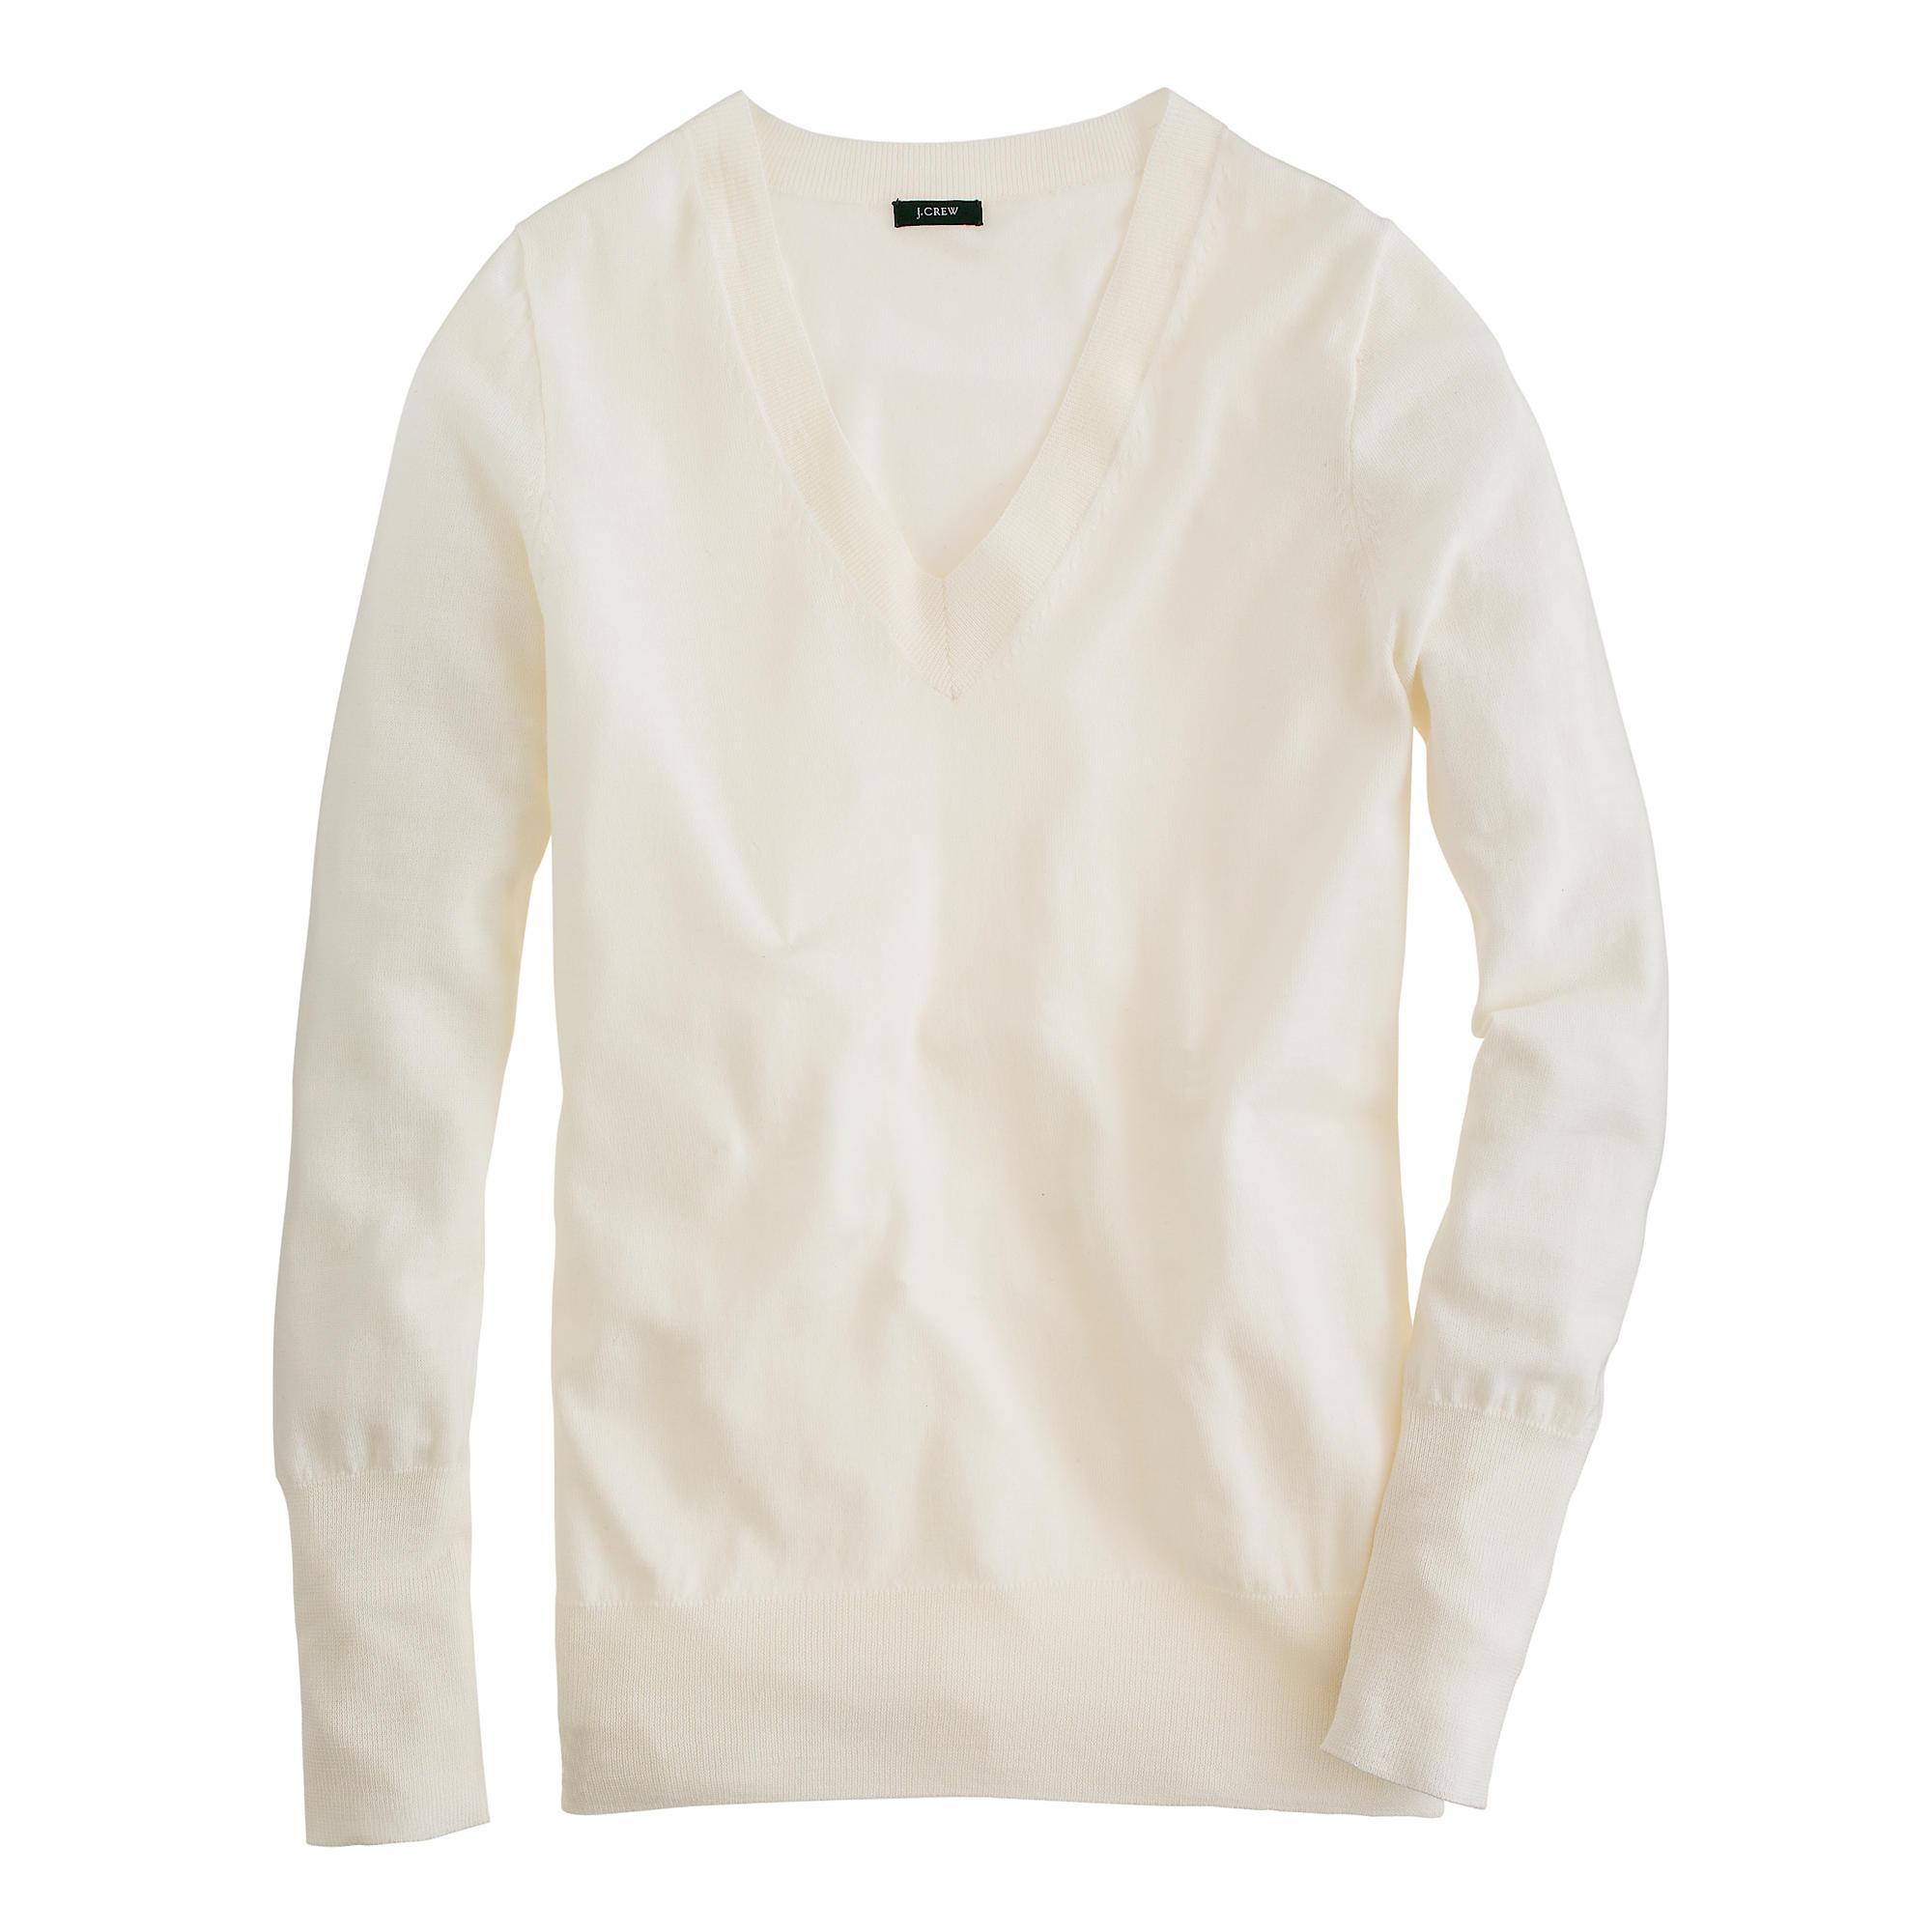 Lyst - J.Crew Merino Wool V-neck Sweater in White 54e8ee9cda